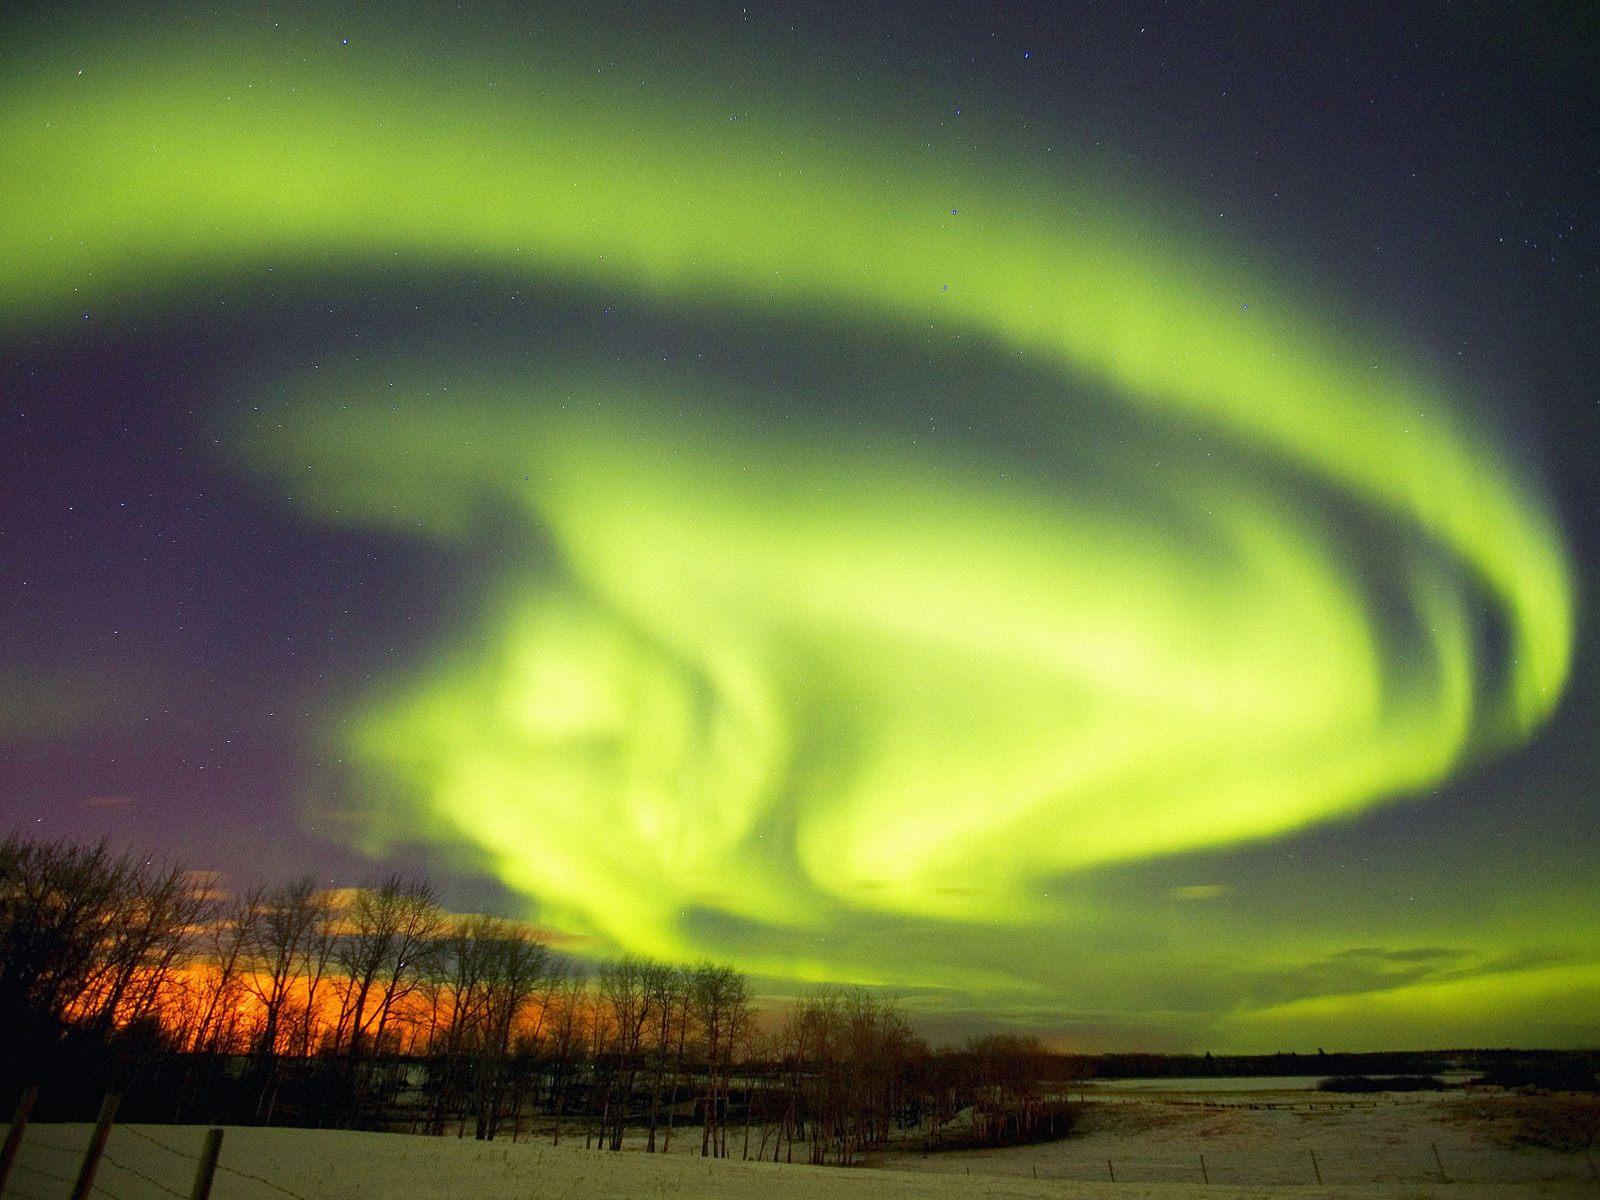 Hd Wallpapers Northern Lights Aurora Borealis 1920 X 1200 609 Kb Jpeg 1600x1200